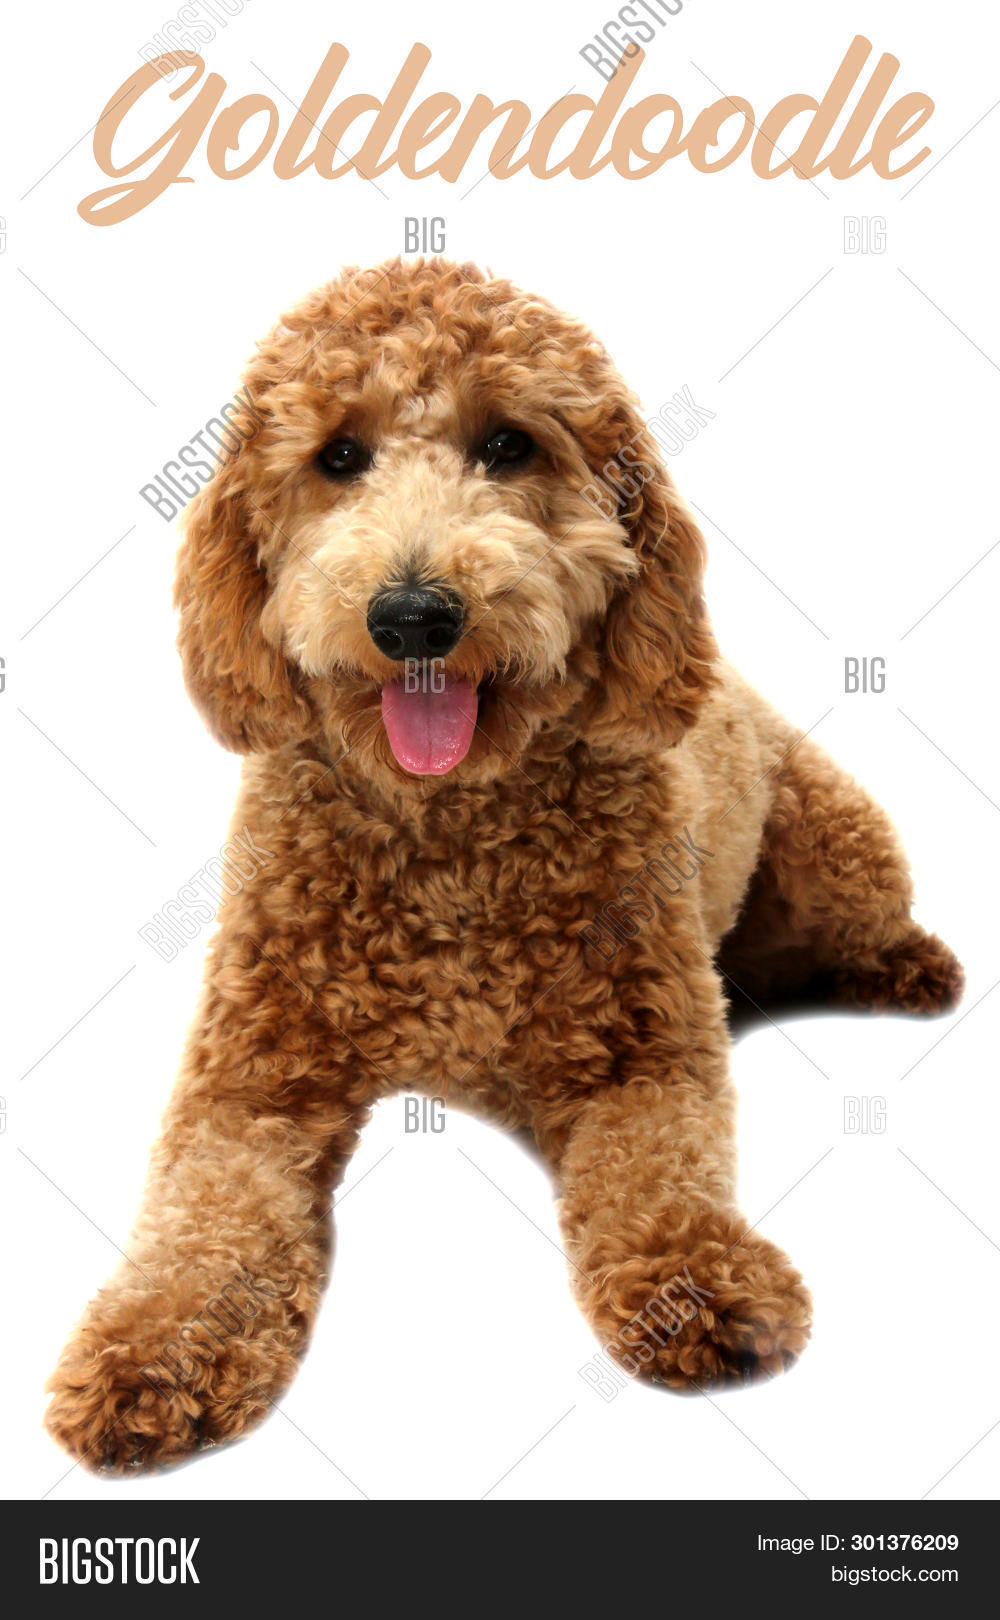 Golden Doodle Dog  Image & Photo (Free Trial)   Bigstock